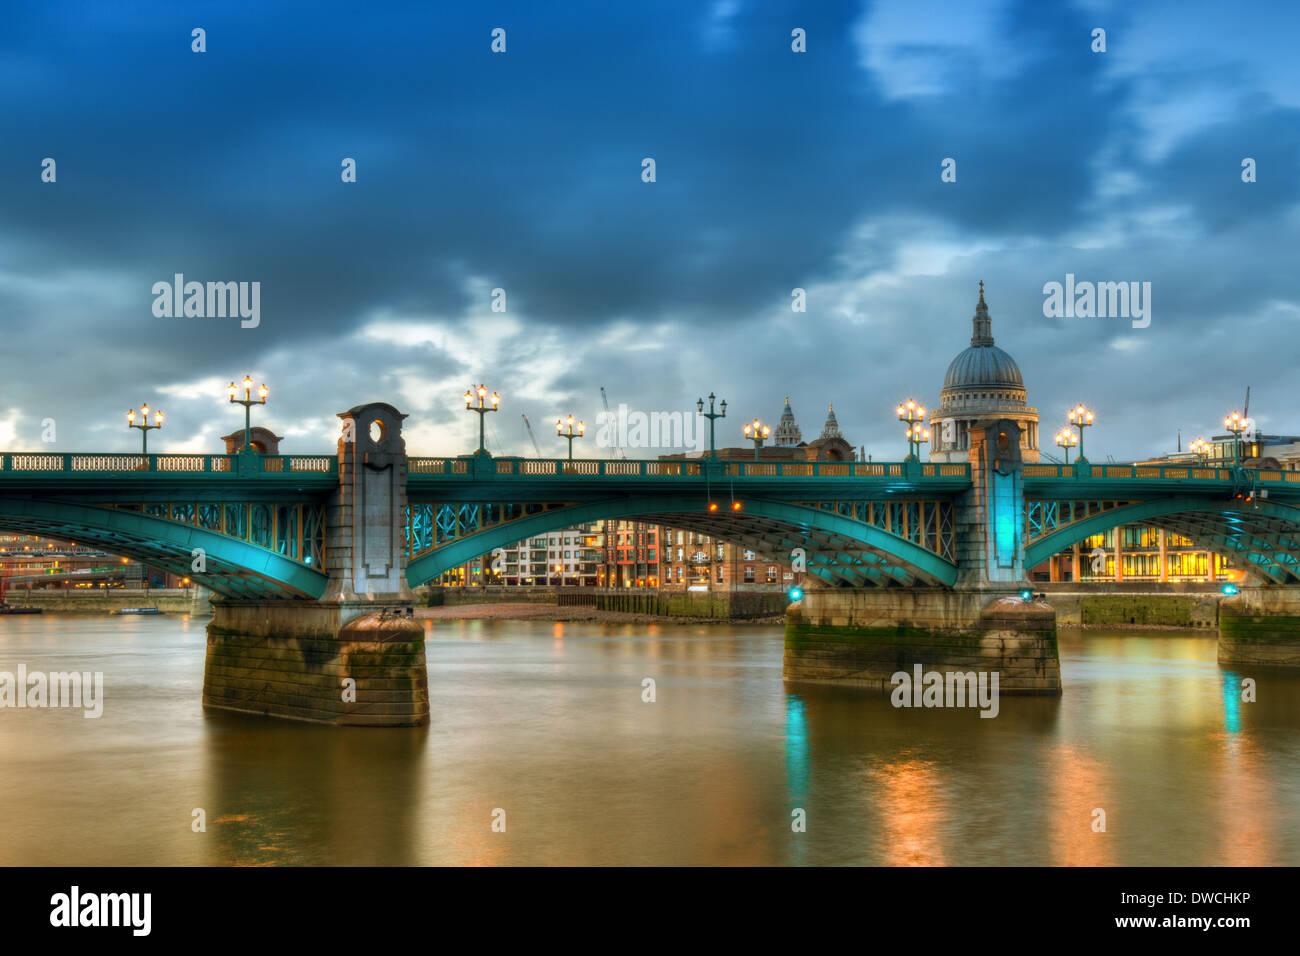 Southwark Bridge - HDR Version, London, England - Stock Image